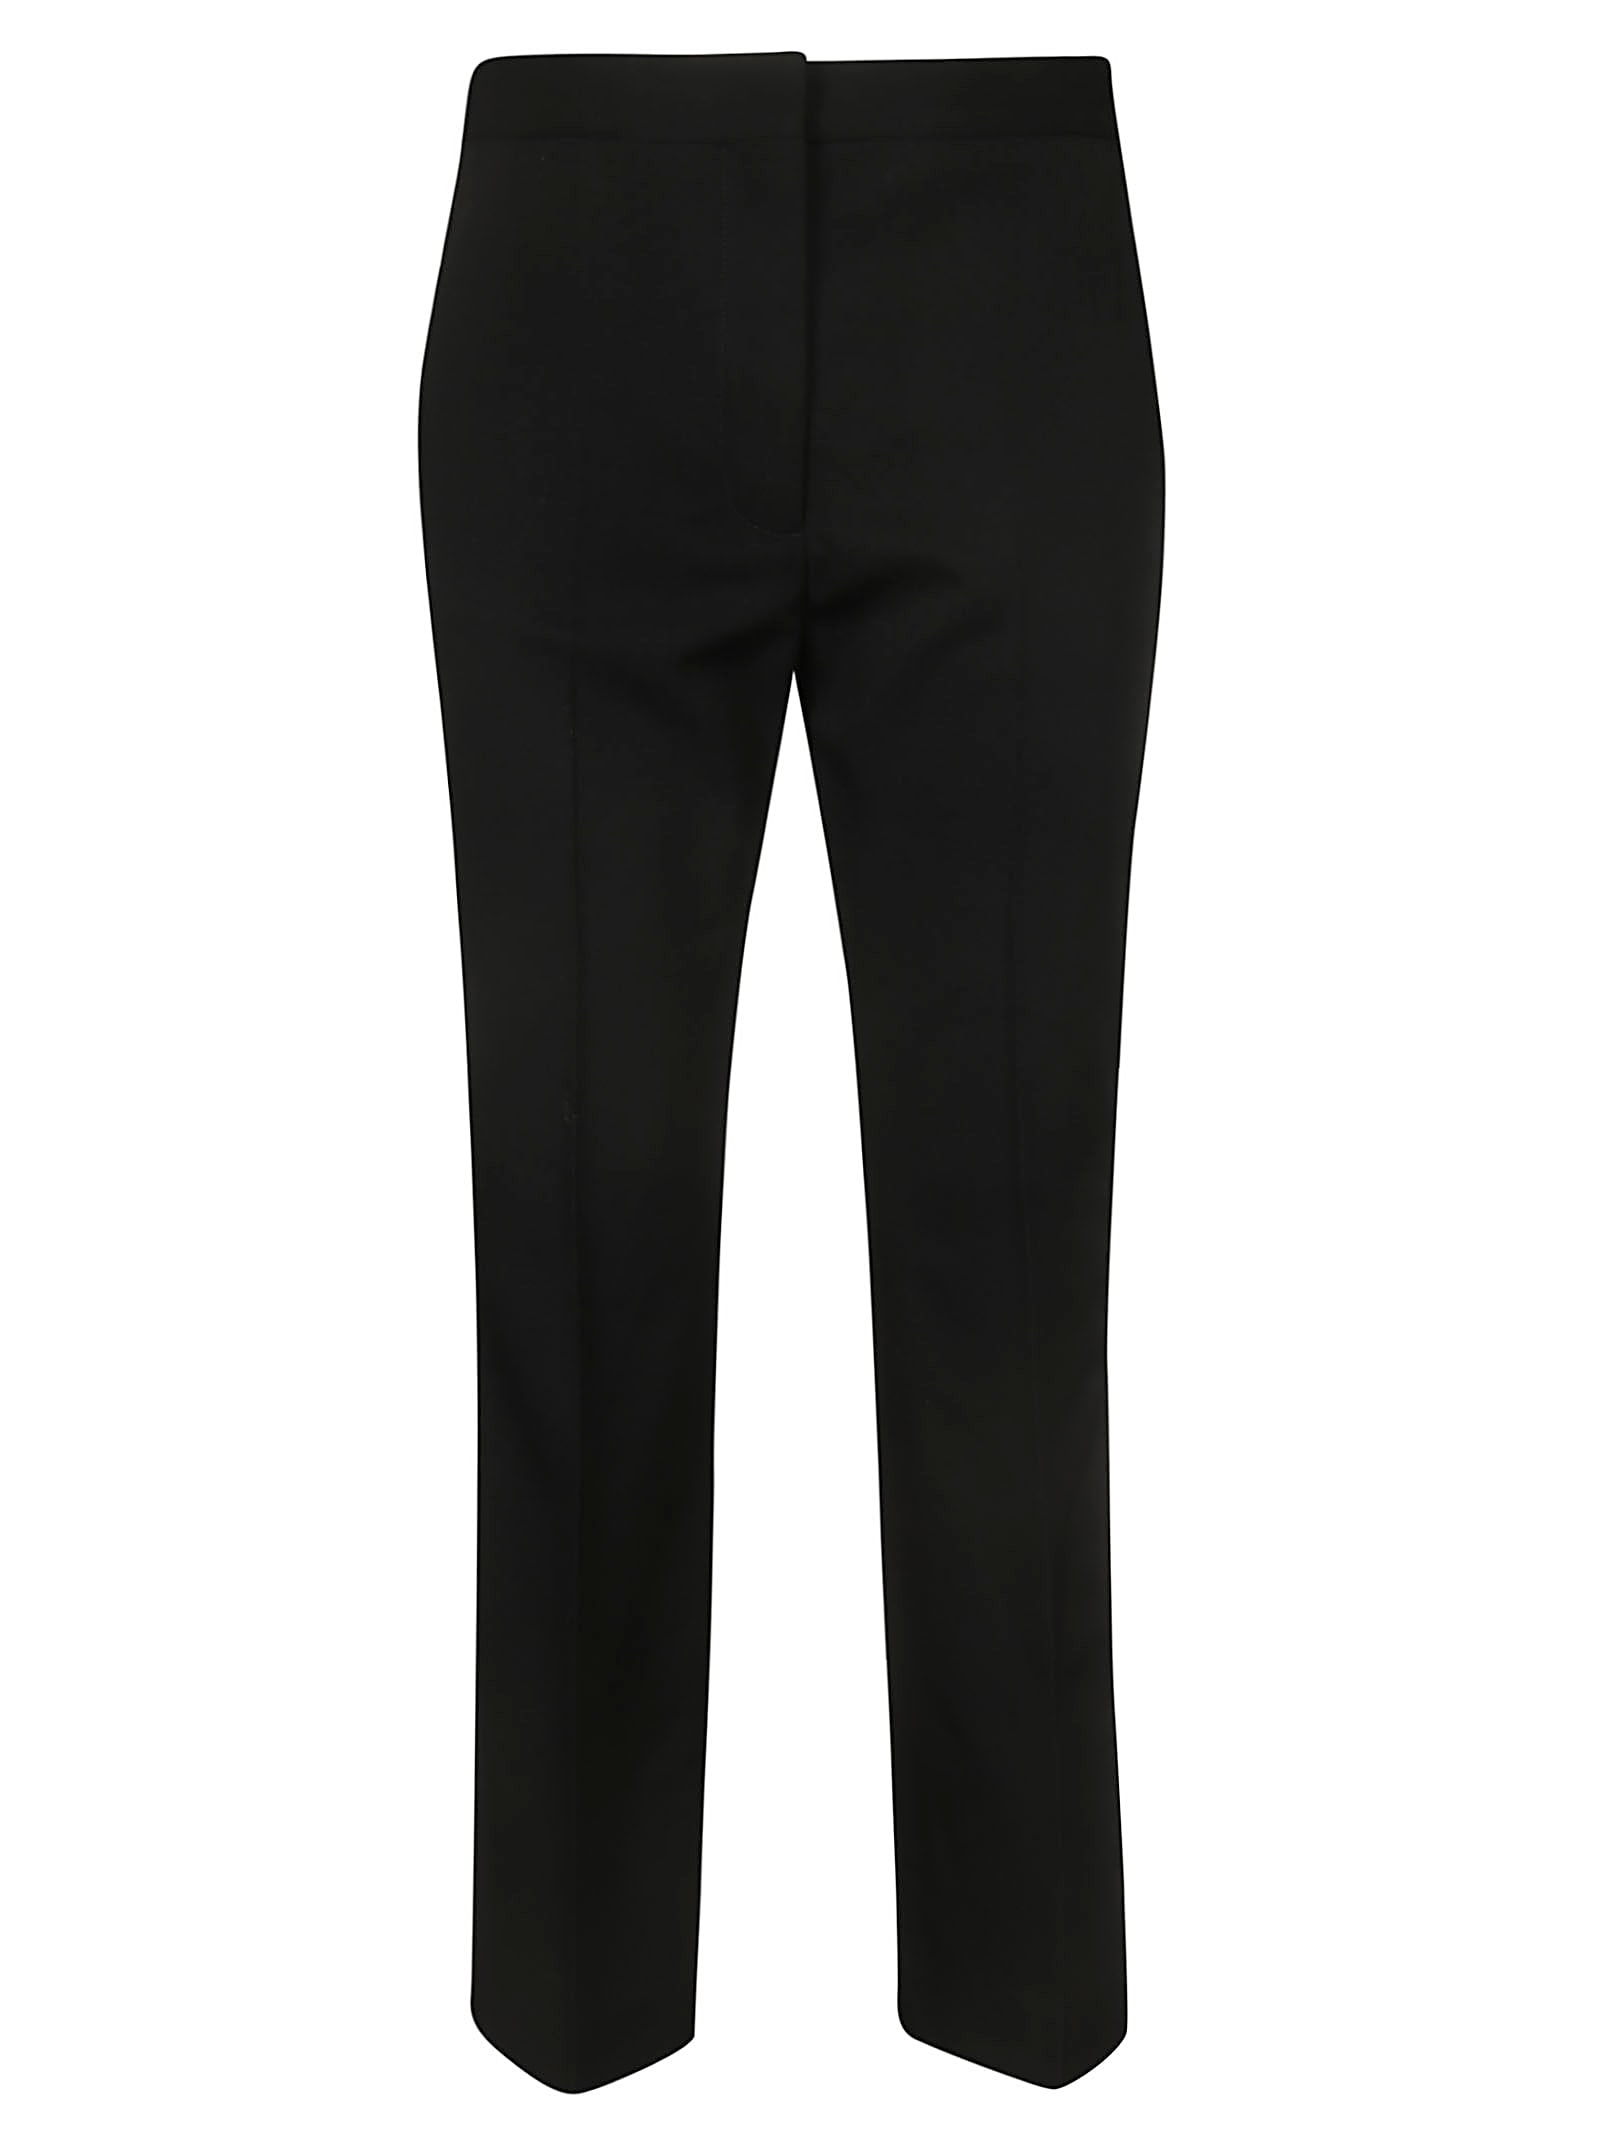 Stella McCartney Classic Trousers